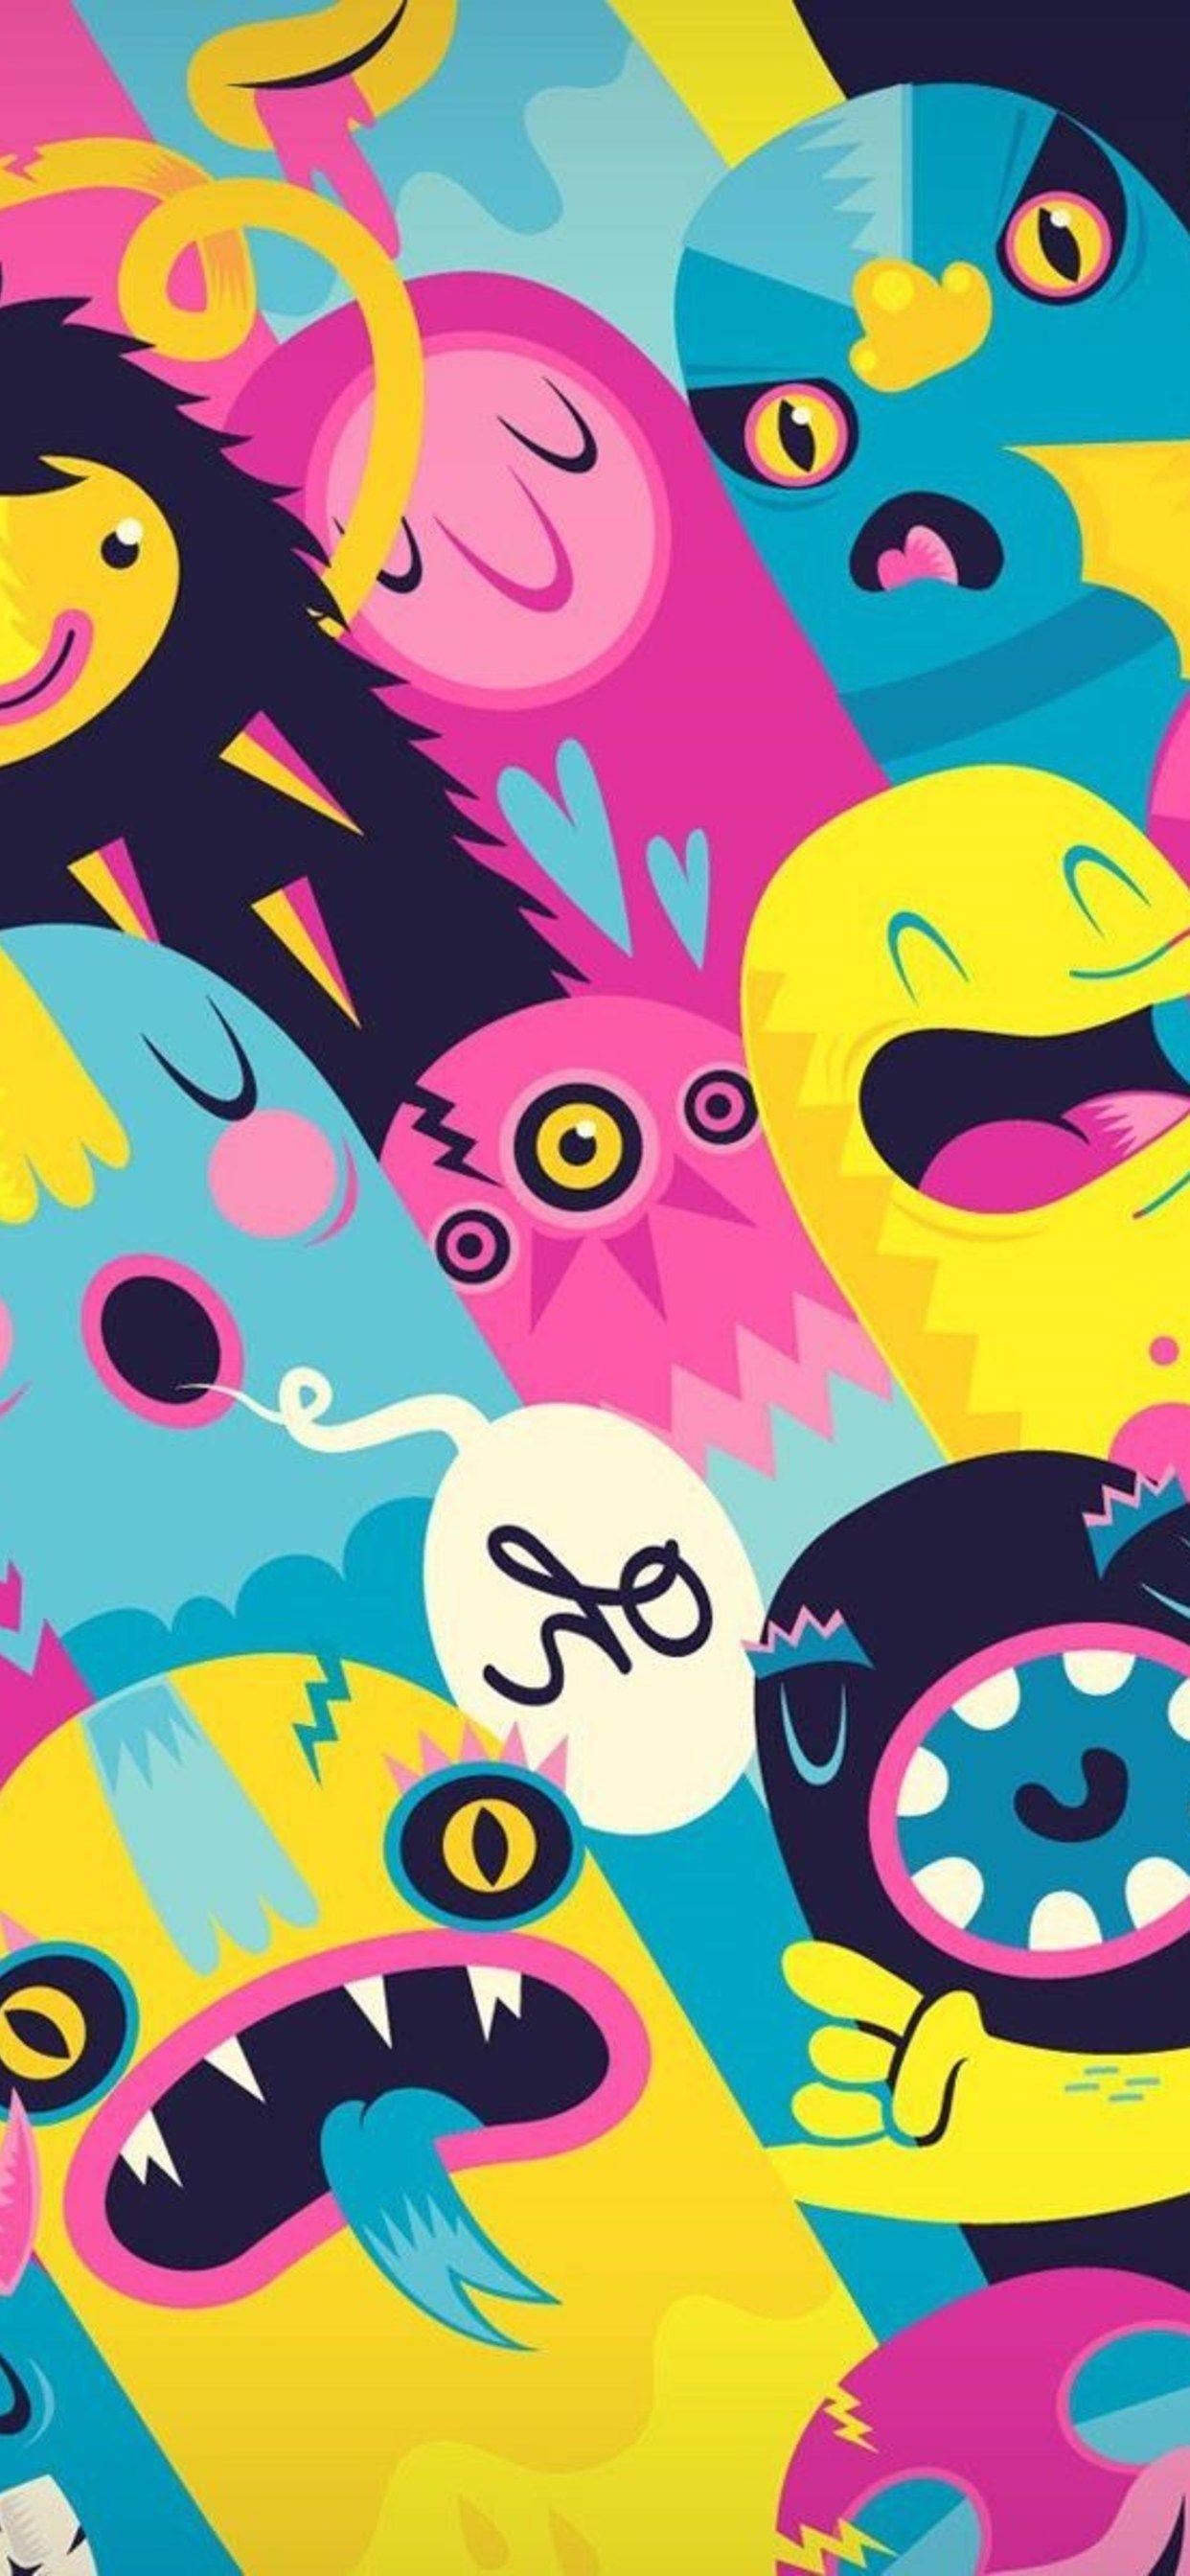 Monsters Iphone wallpaper Iphone wallpaper, Elephant